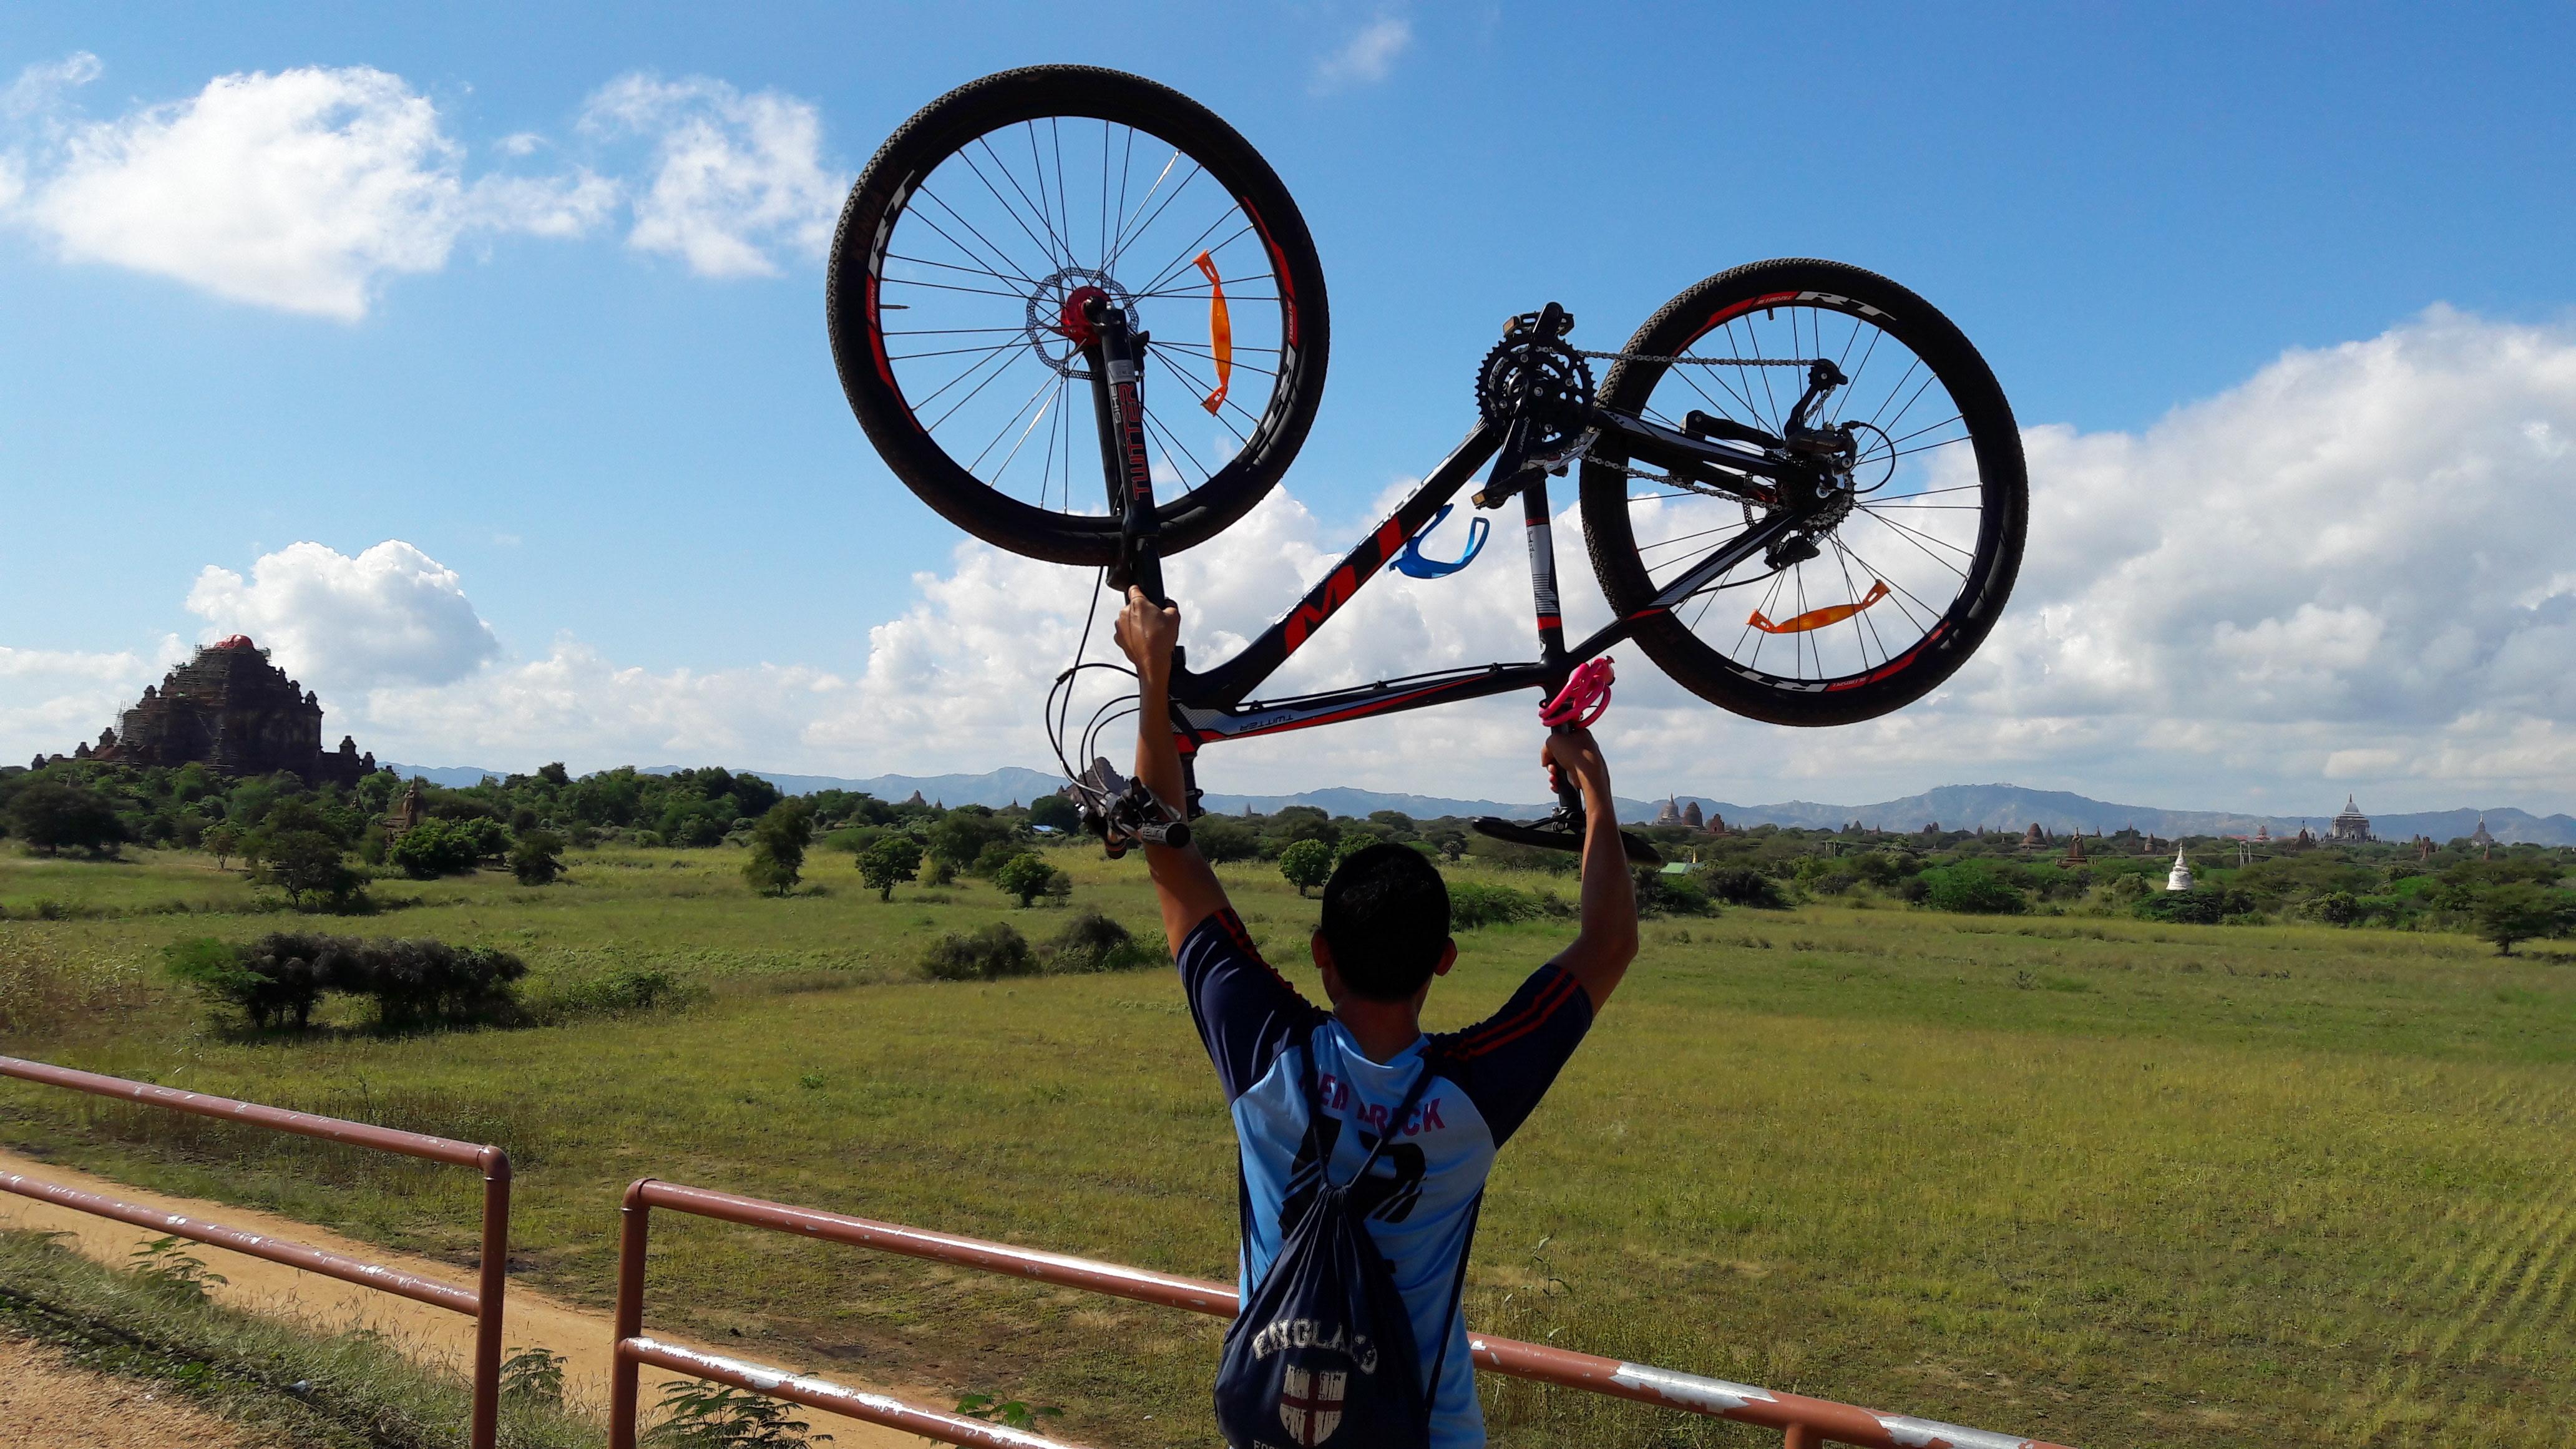 Mountain biking in Bagan is a great experience